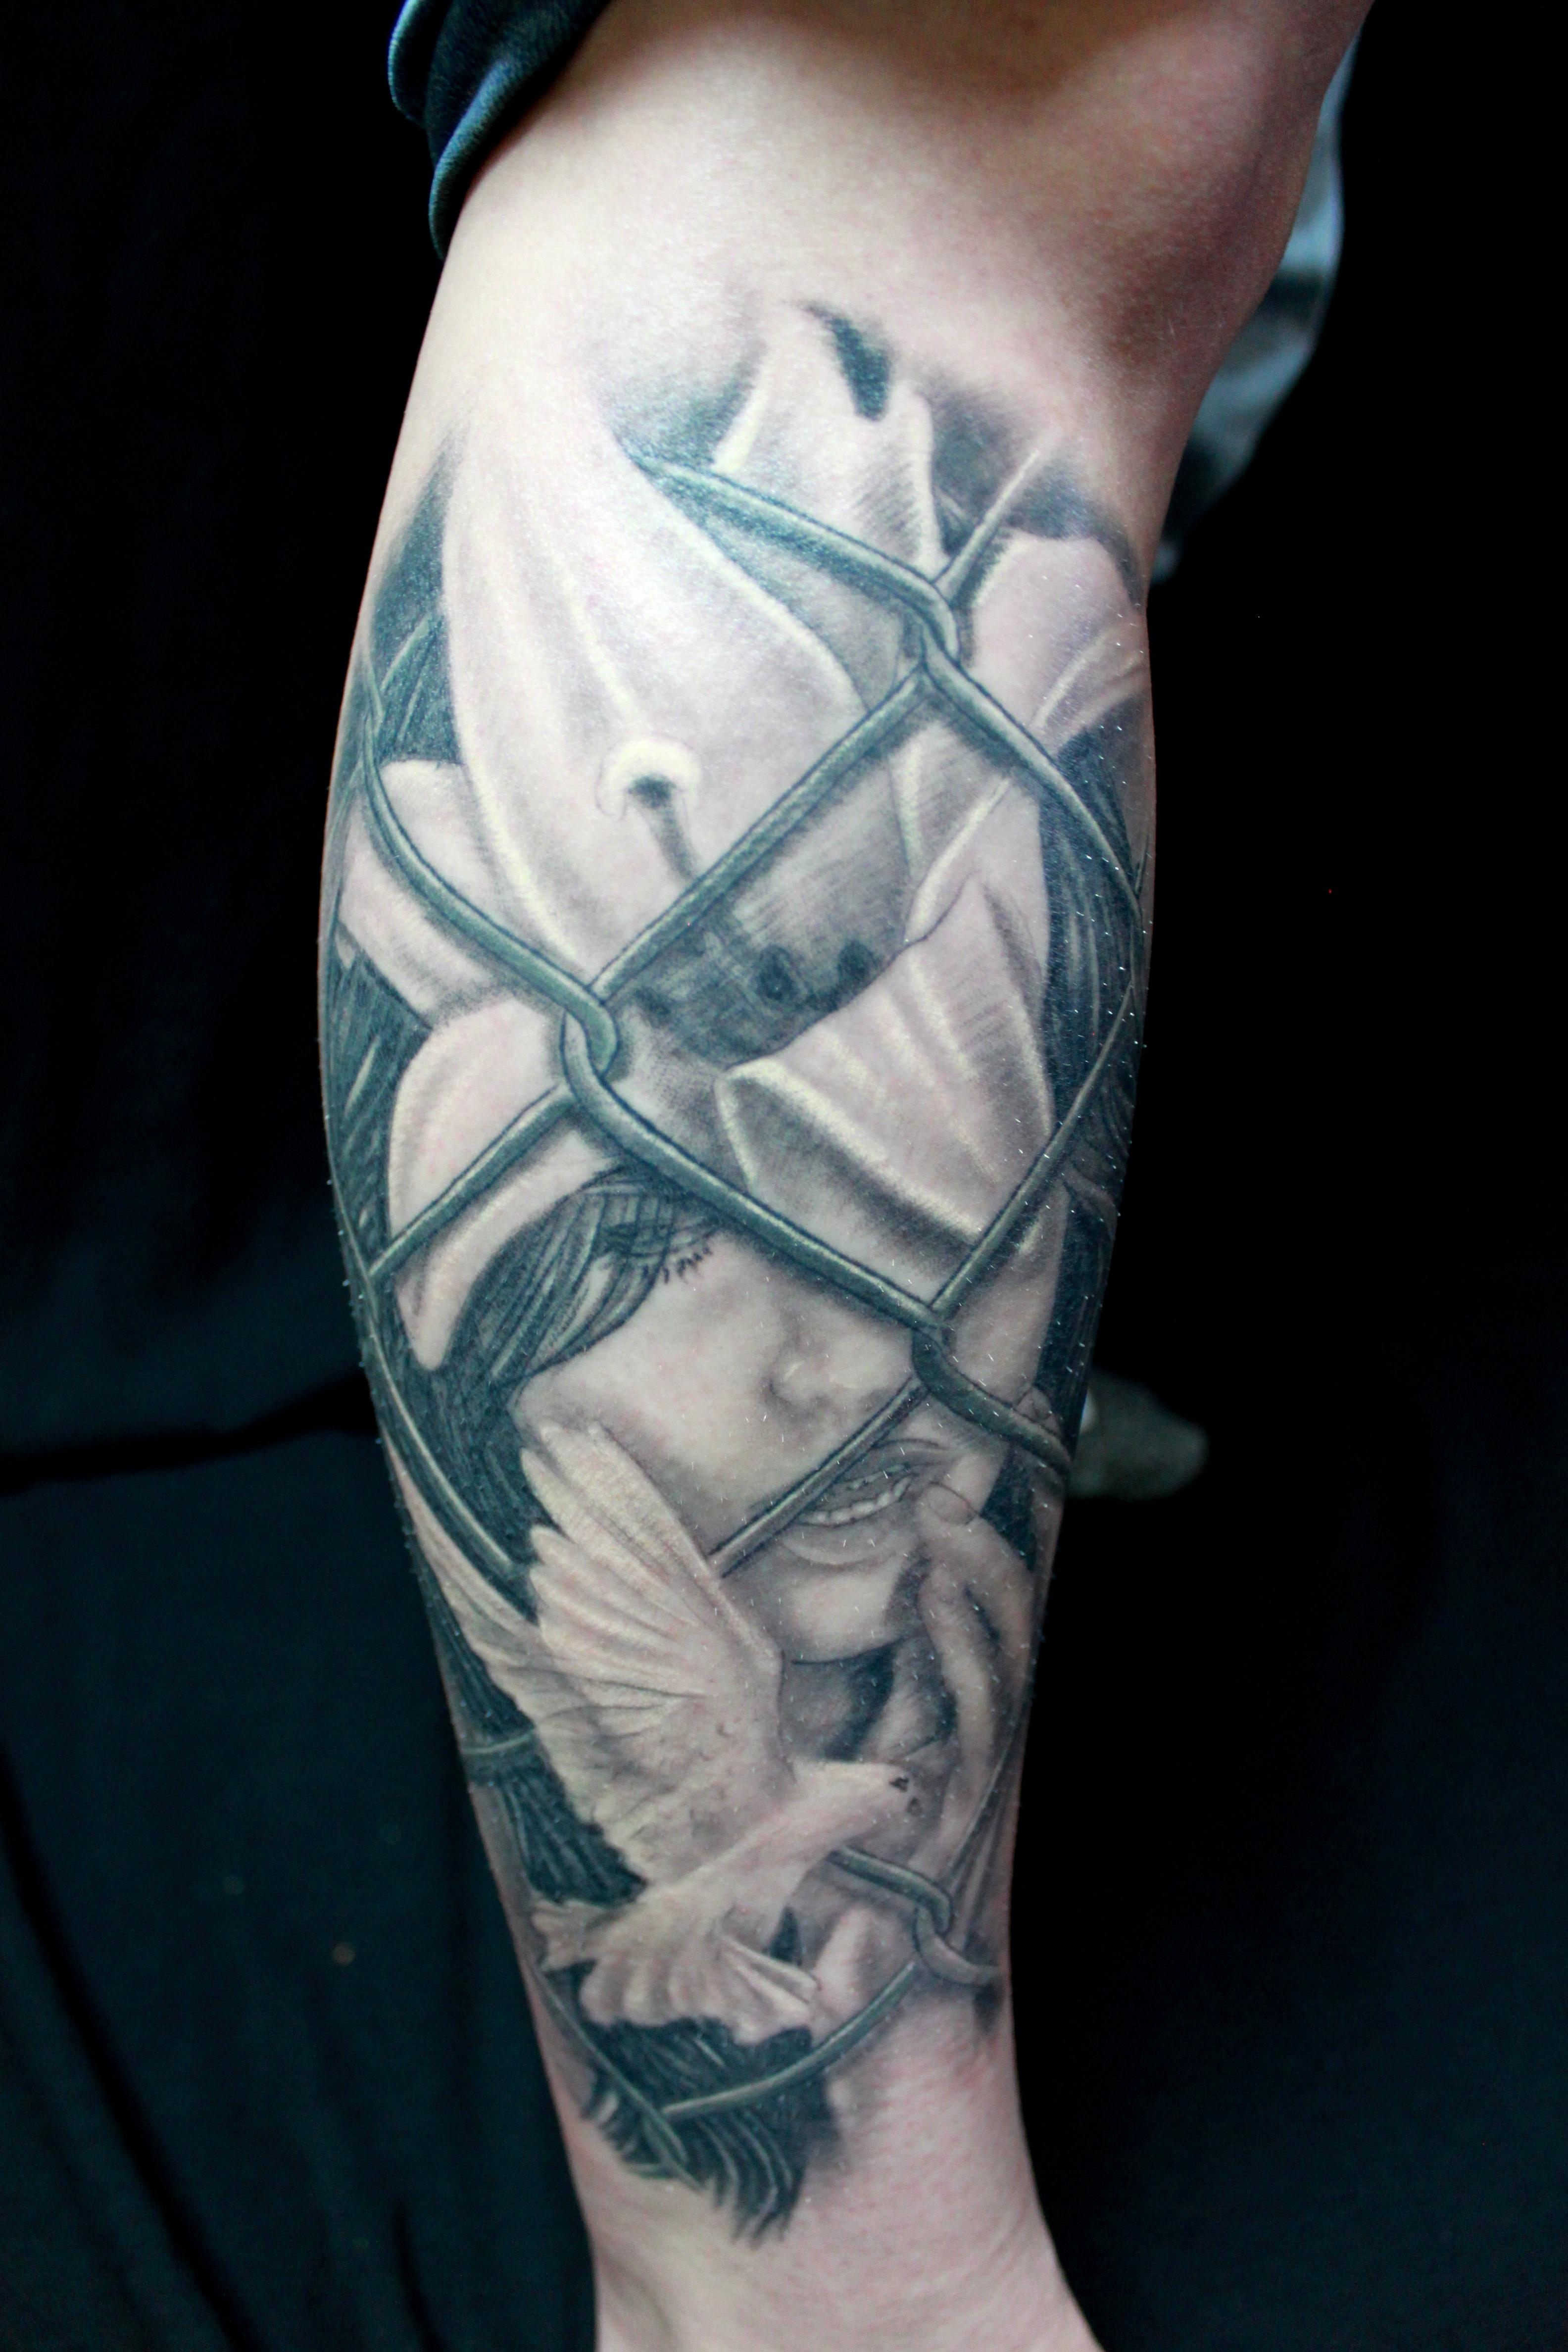 23f2487dcbe23 hand flower leg portrait tattoo arm chest human body realistic tattoo artist